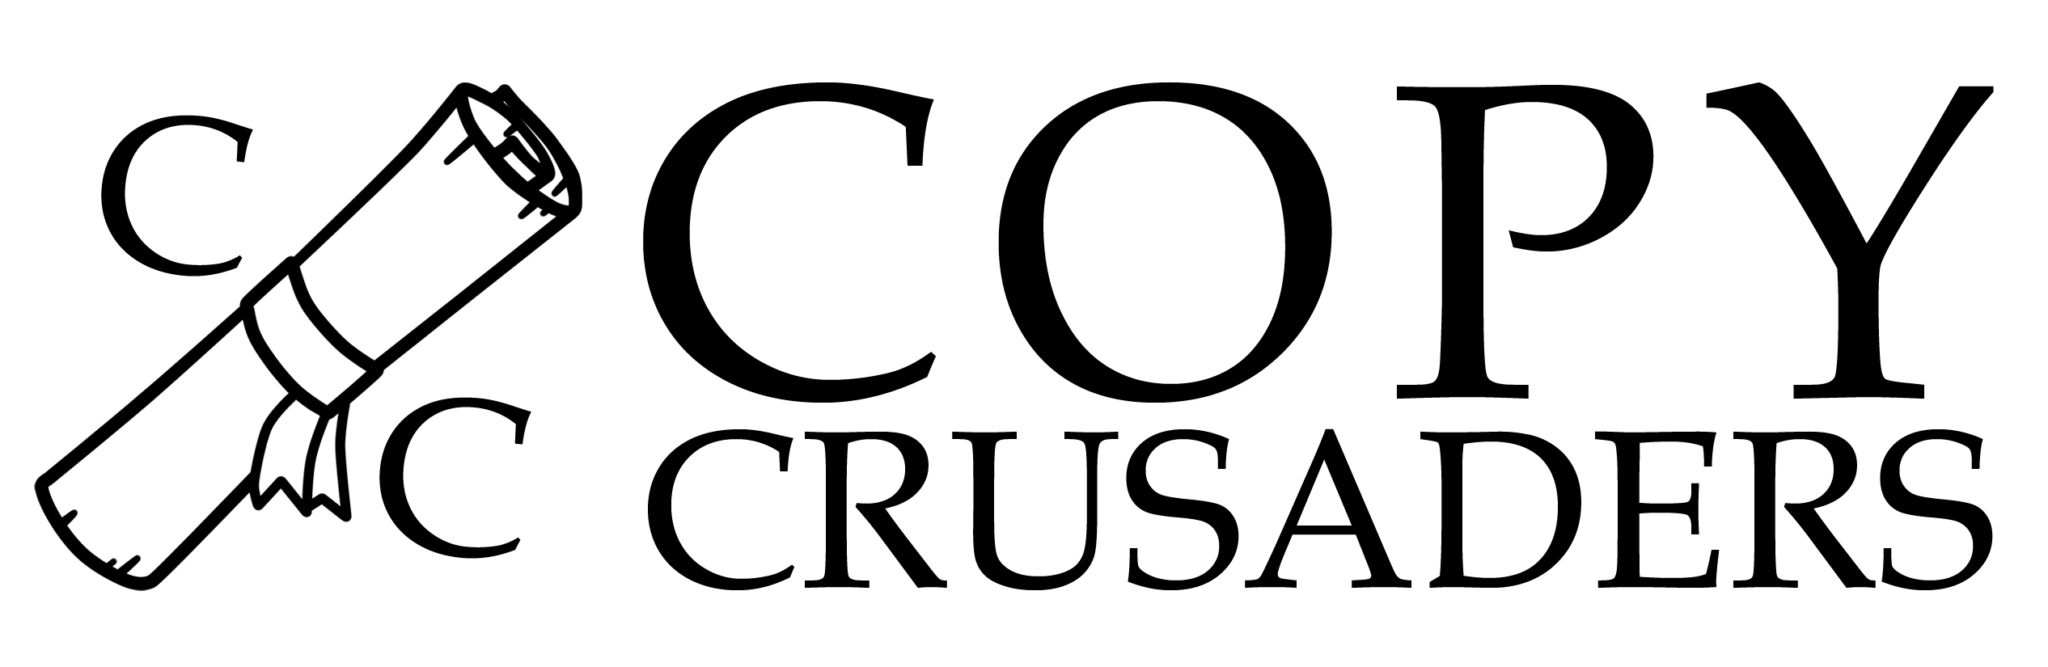 copy-crusaders-logo-v7-copy